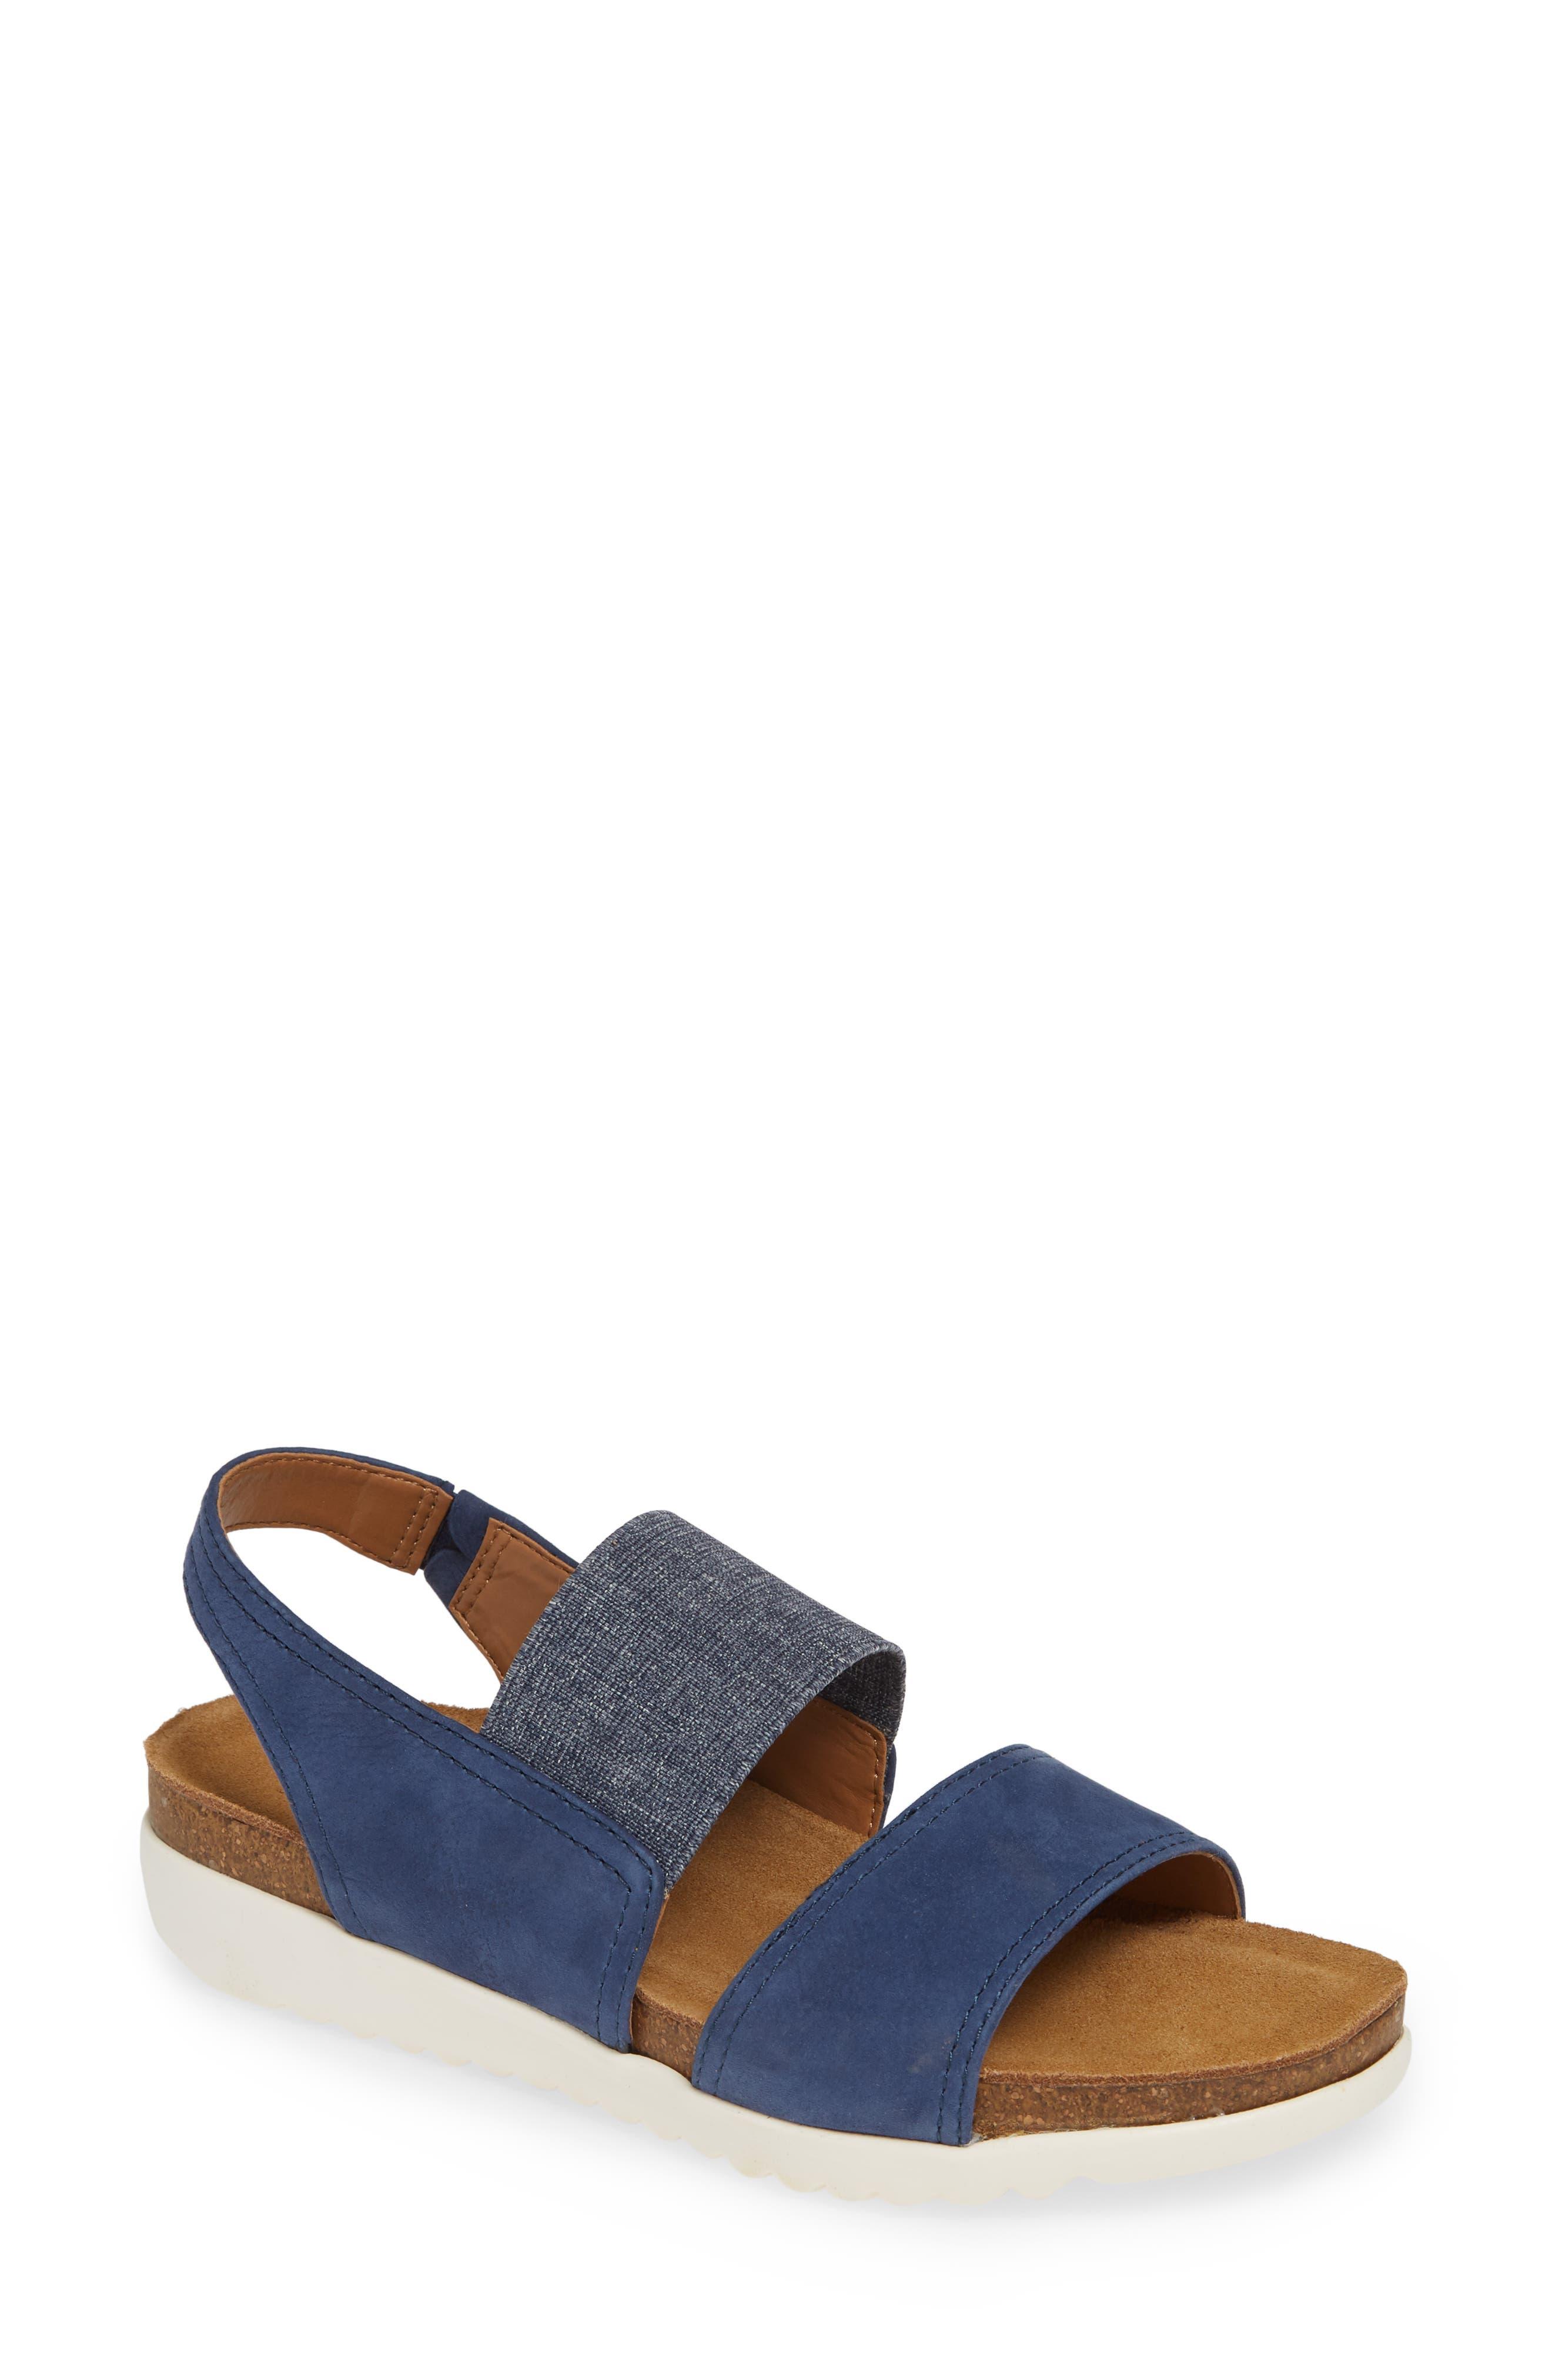 Comfortiva Elicia Wedge Sandal, Blue